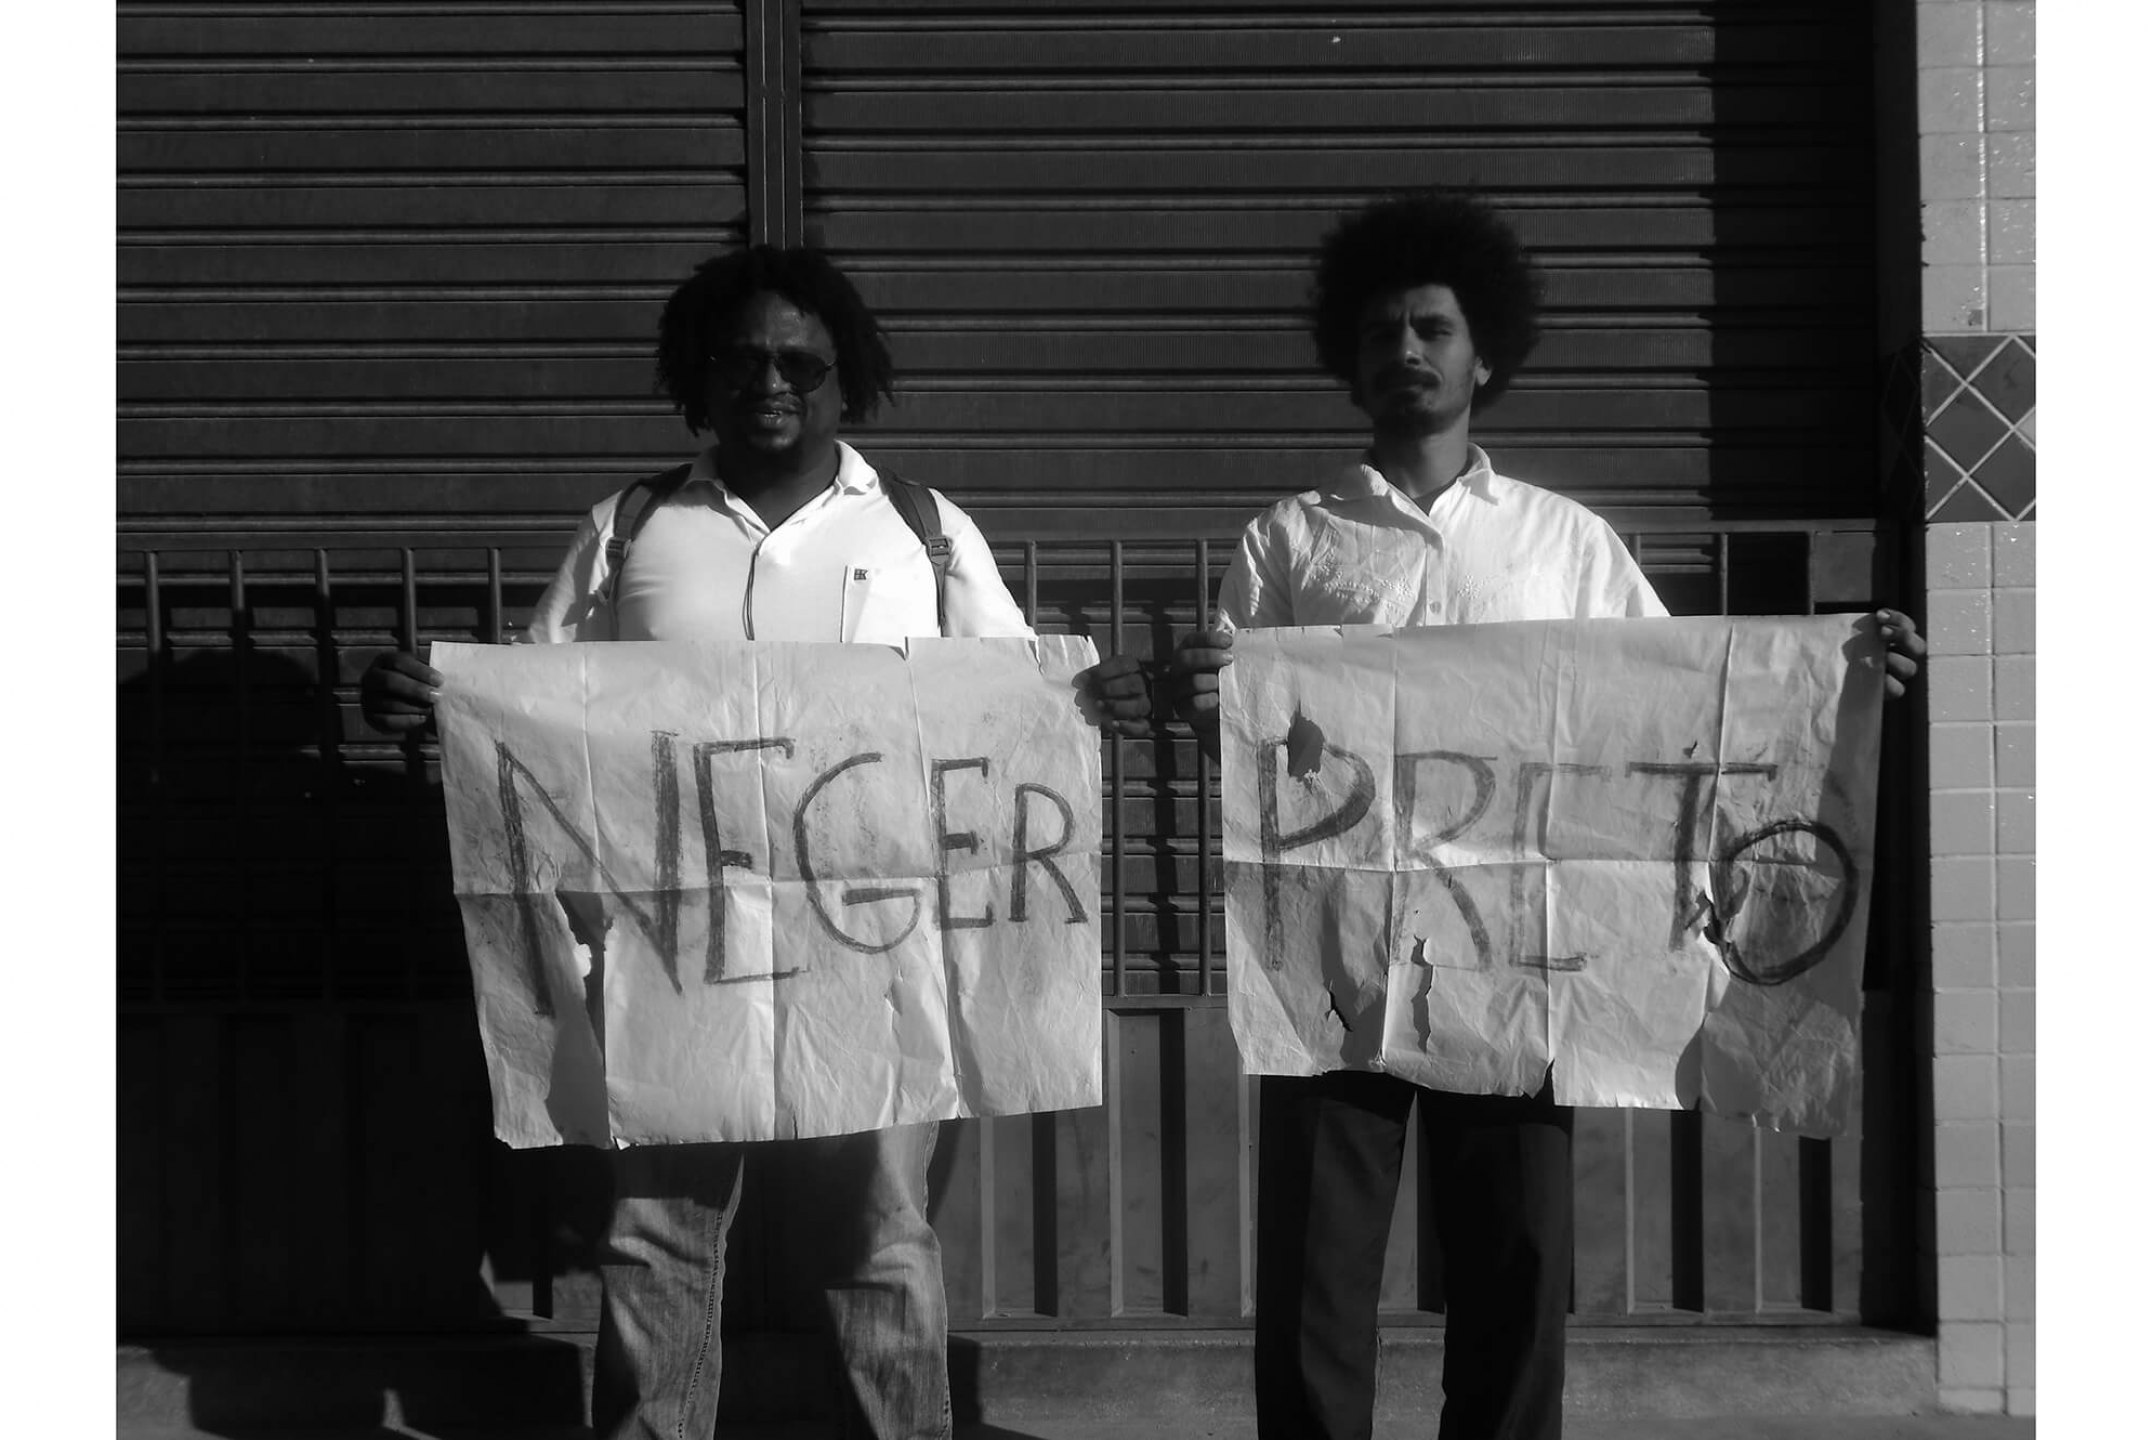 Paulo Nazareth,<em>Black neger, from Cadernos de África project,</em>2012/2013, print on newsprint (pile with 1000 prints), 85 × 119 cm - Mendes Wood DM